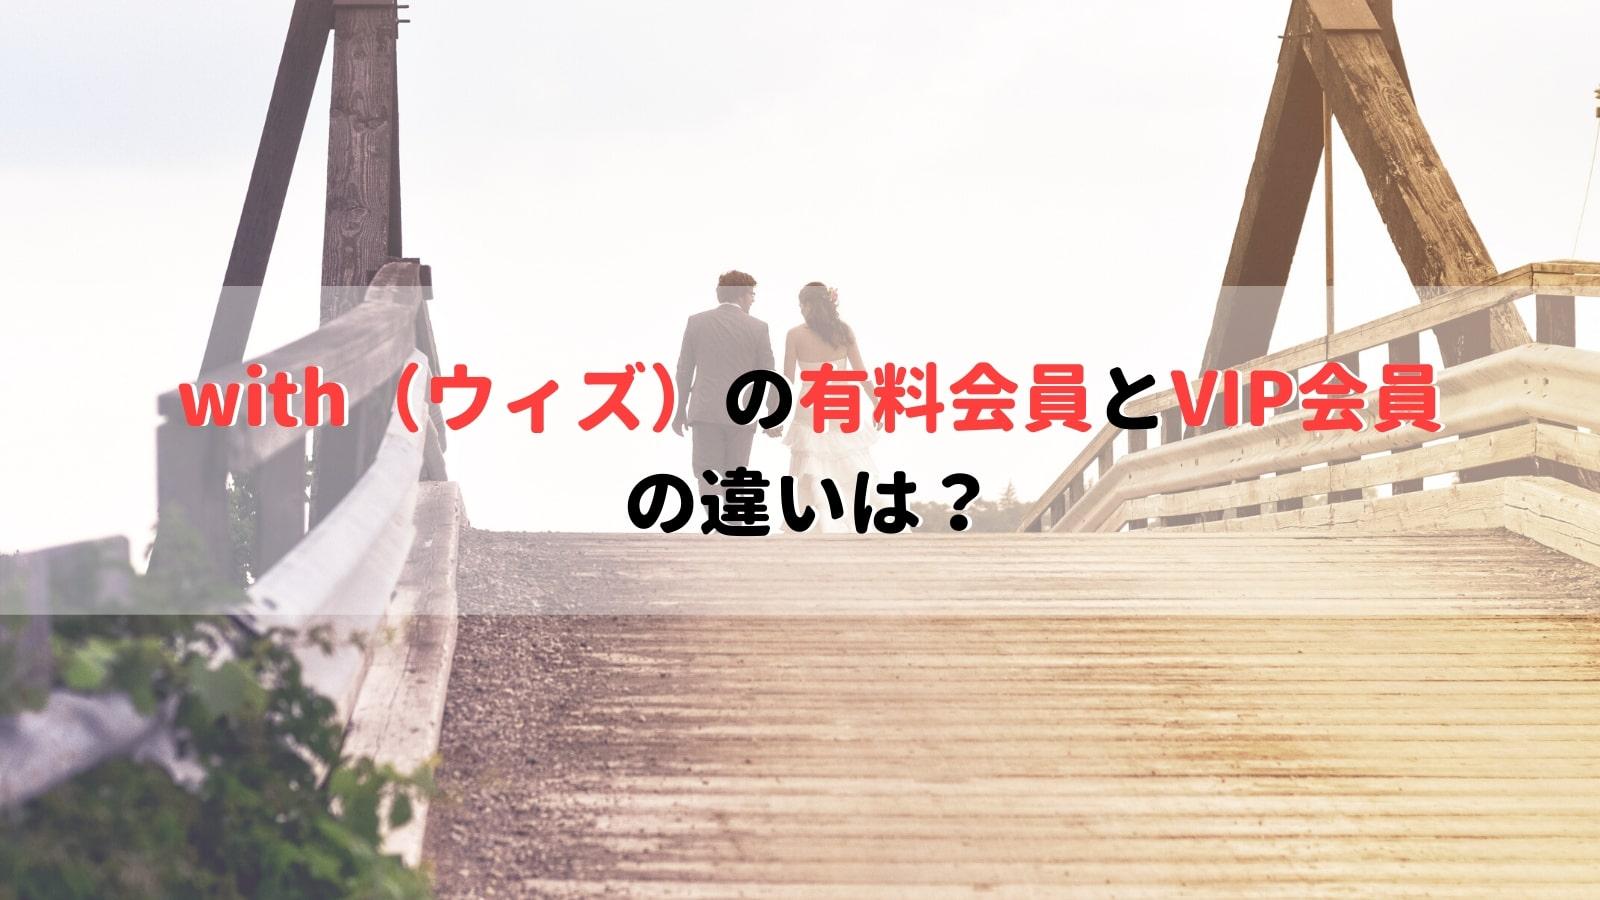 with(ウィズ)の有料会員とVIP会員の違いは?